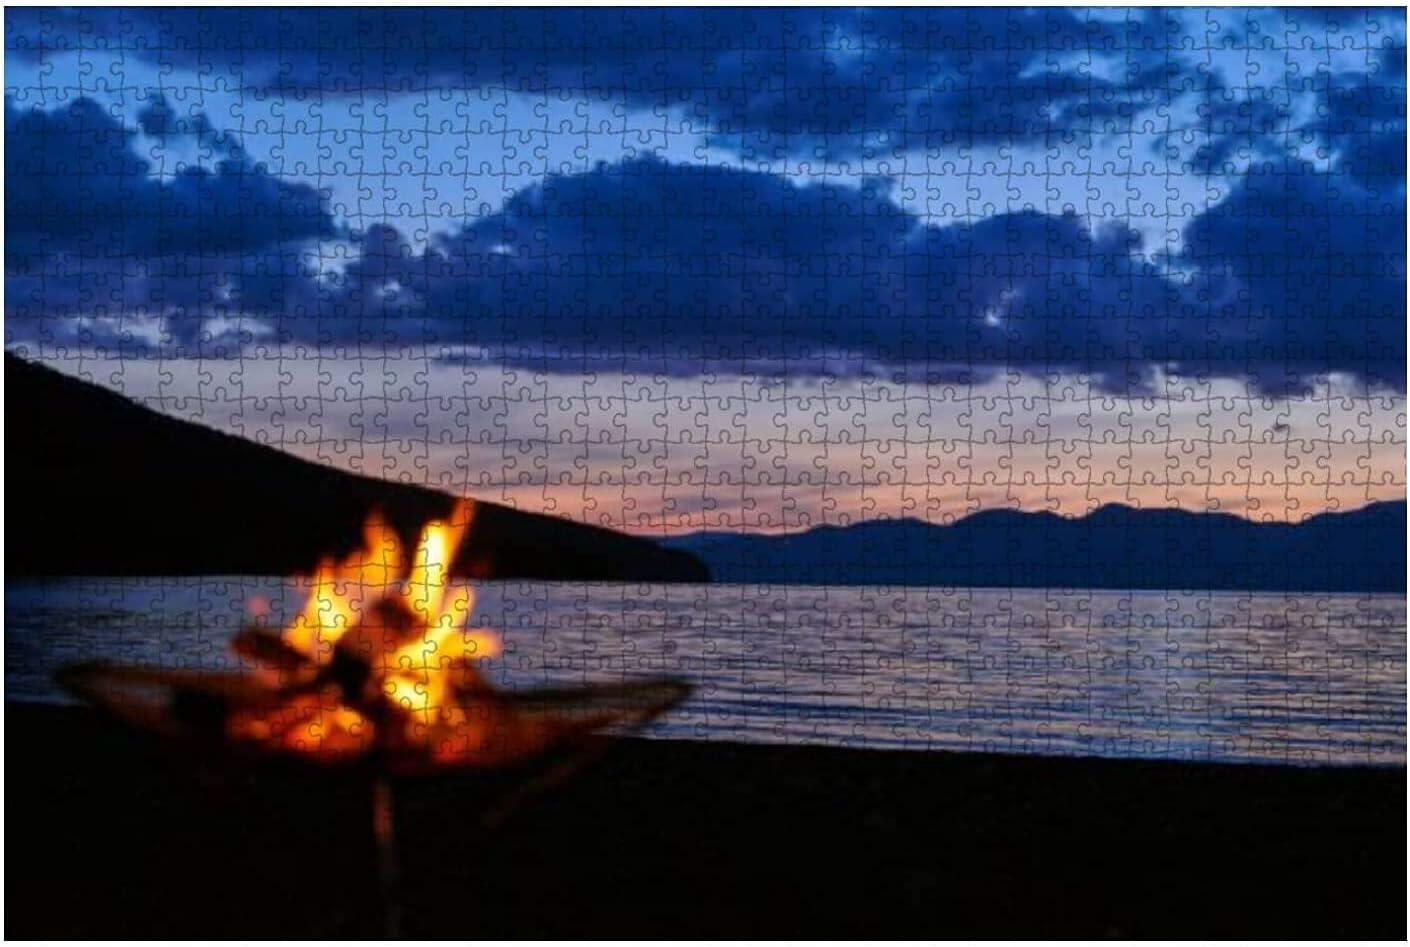 1000 Pieces-with a Bonfire Trust Trust at Wooden Shikotsu Lake Dusk Jigsa